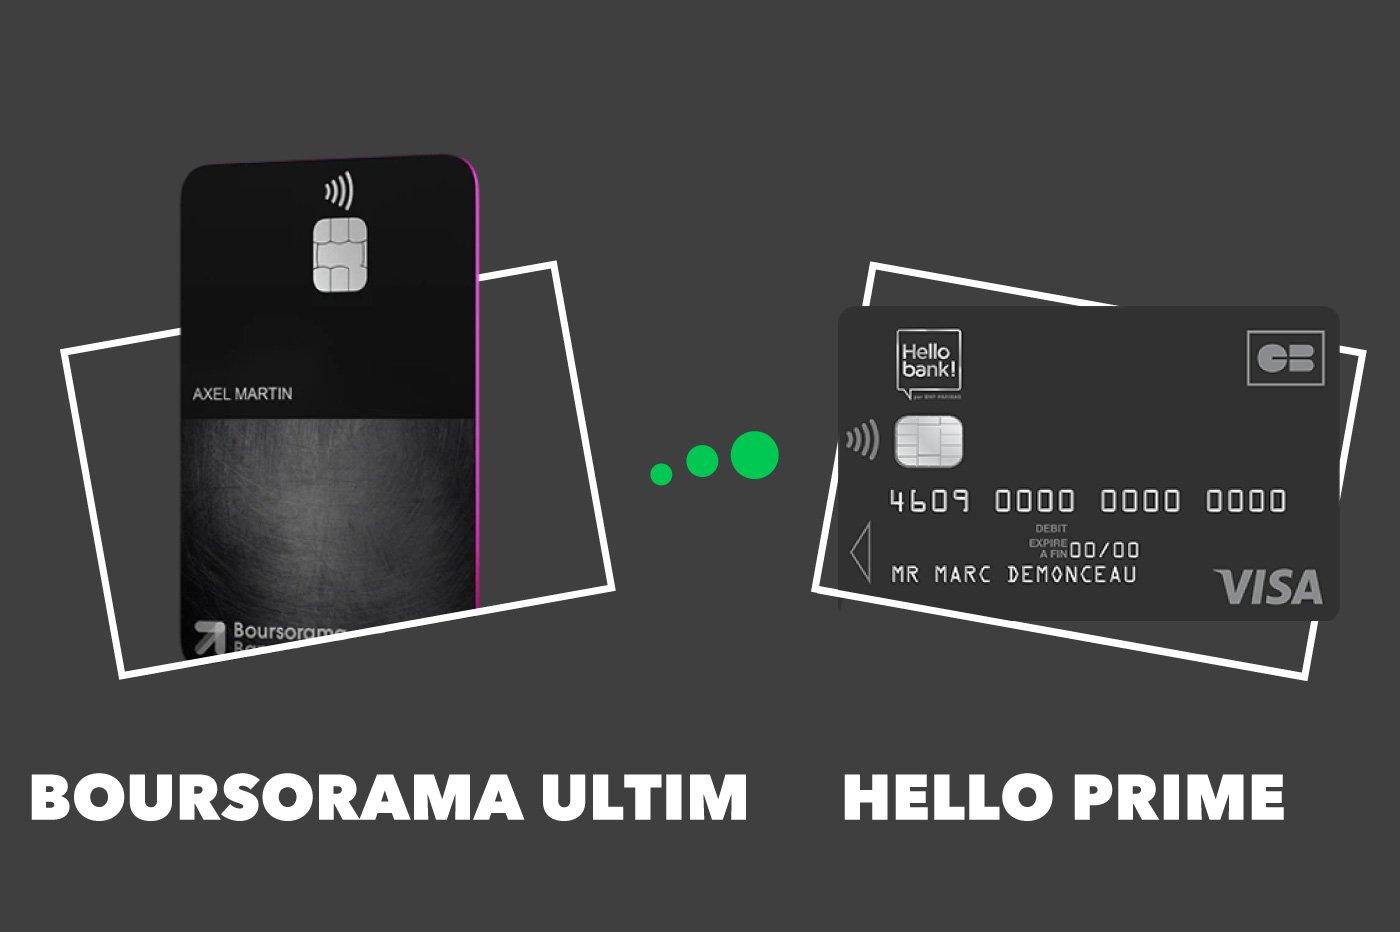 Boursorama Ultim Hello Prime